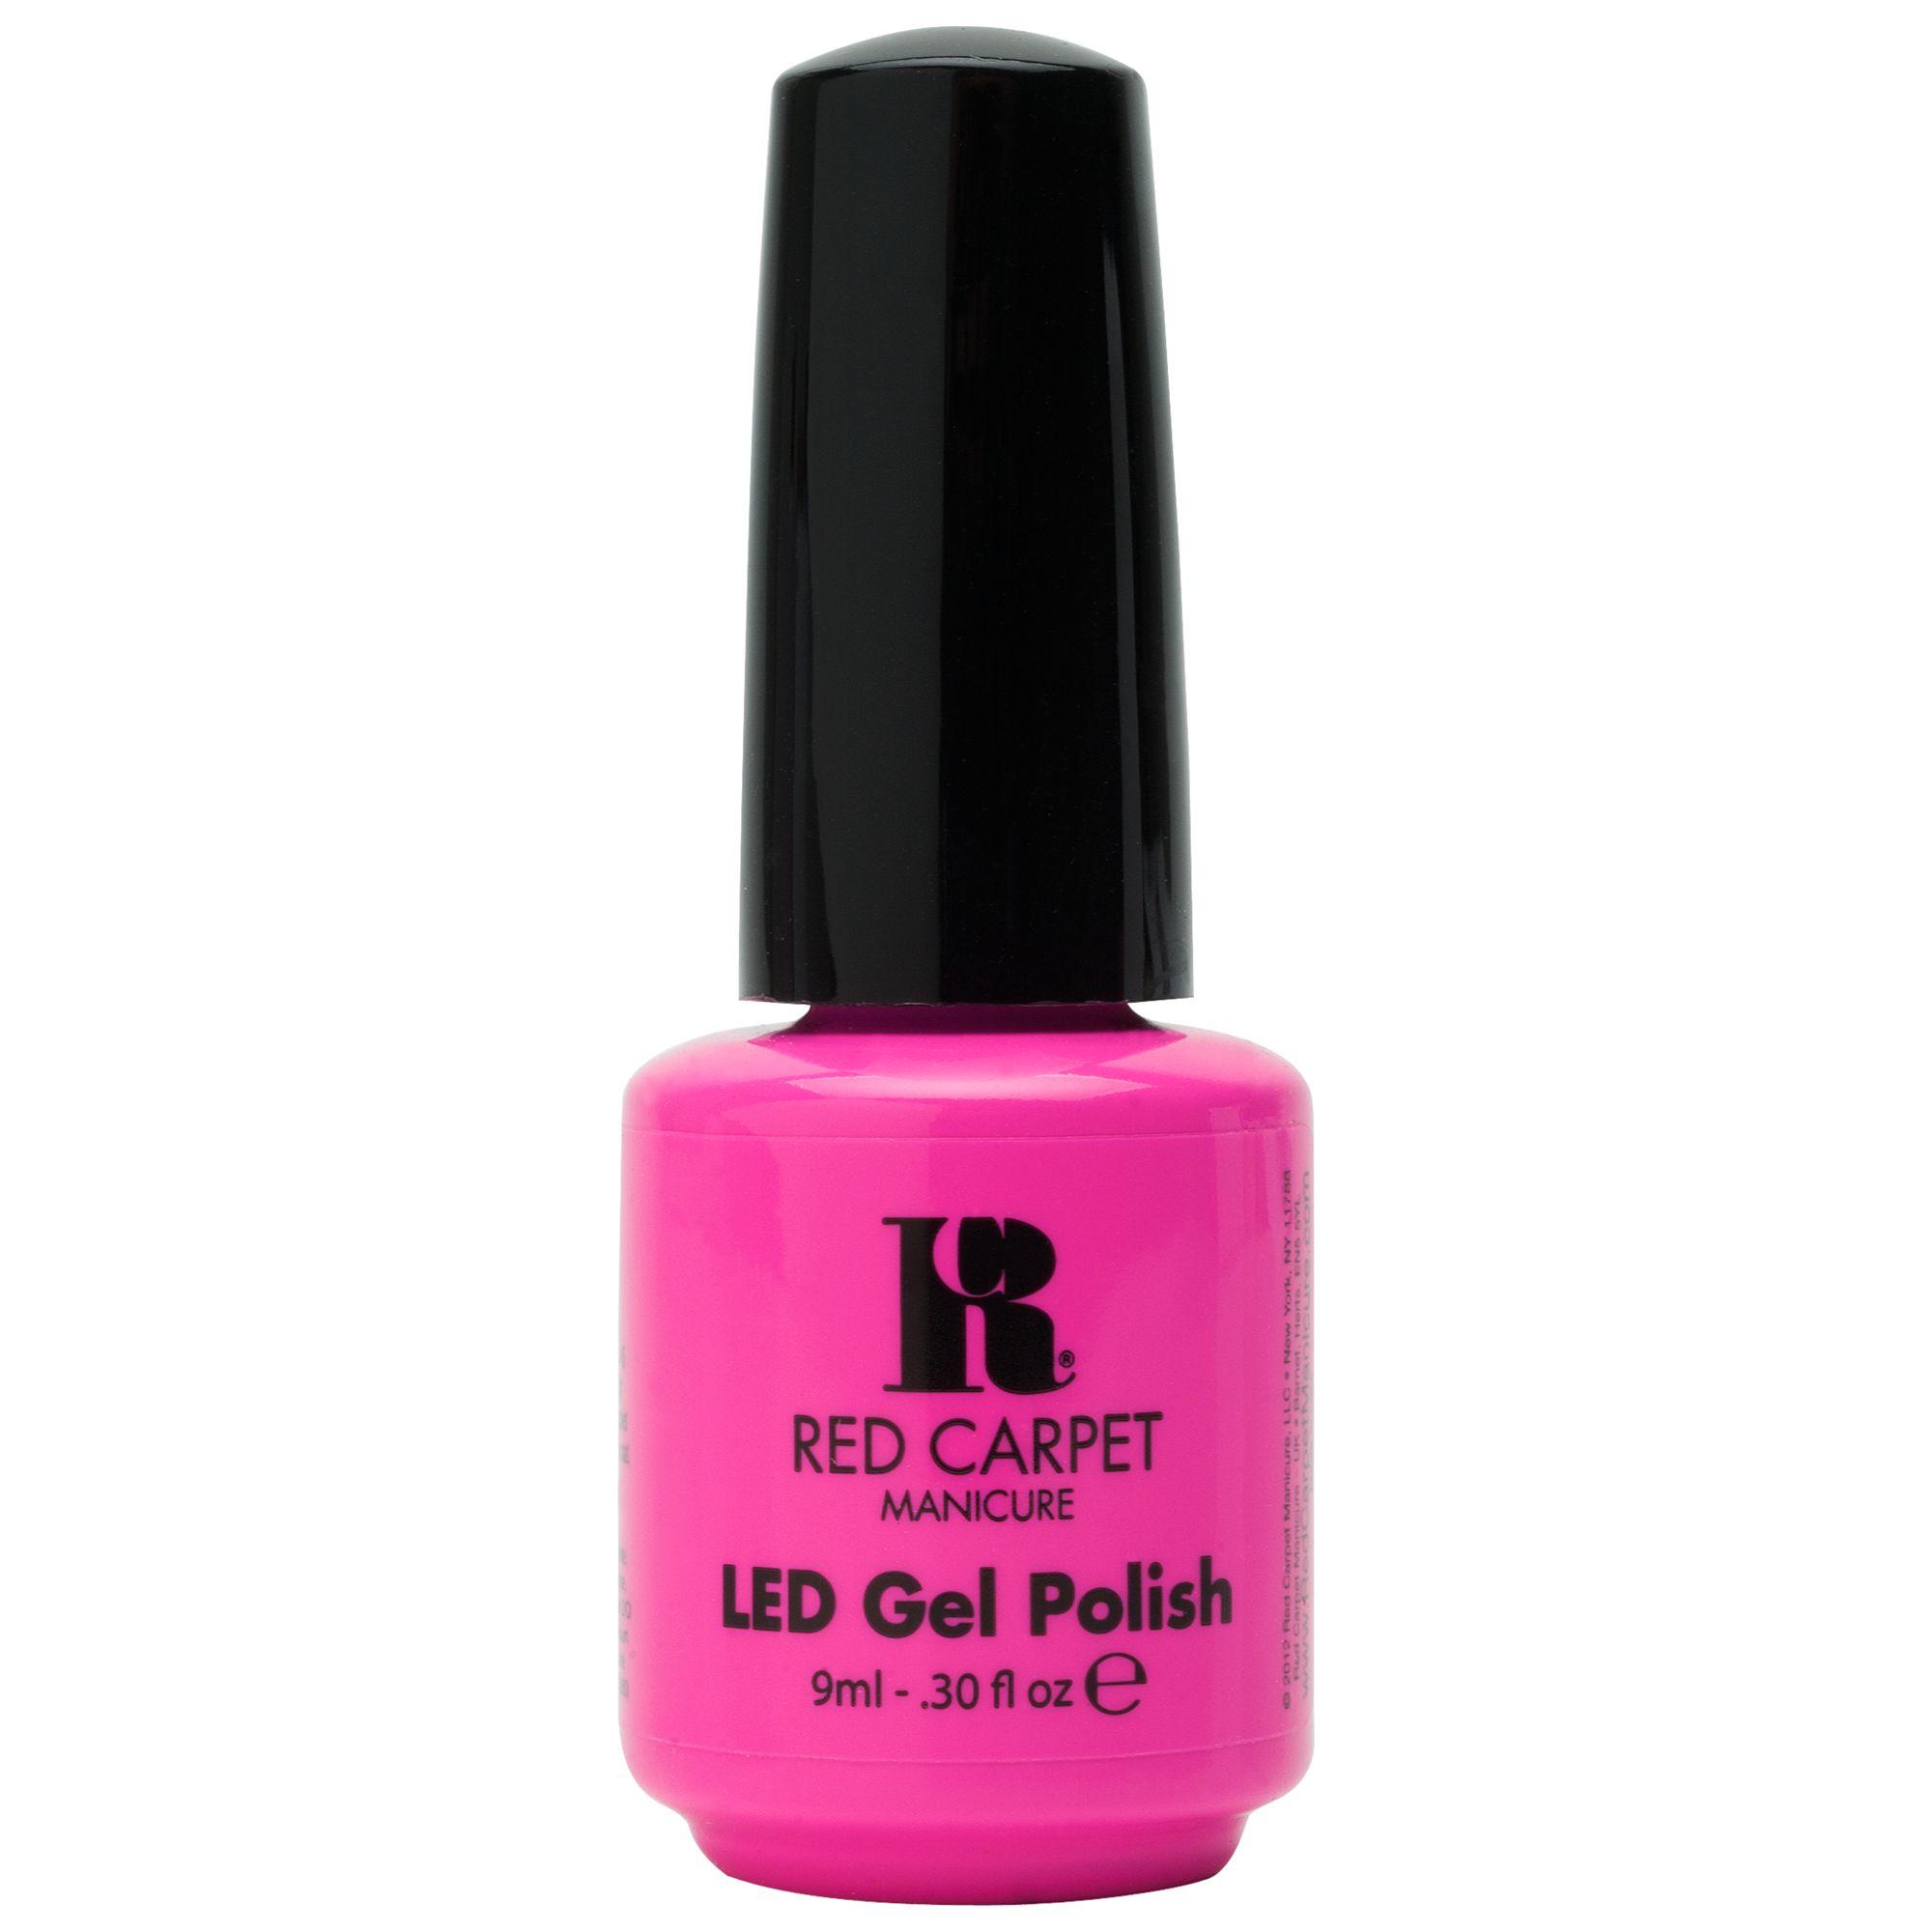 Red Carpet Manicure Red Carpet Manicure LED Gel Nail Polish - Pinks & Nudes, 9ml